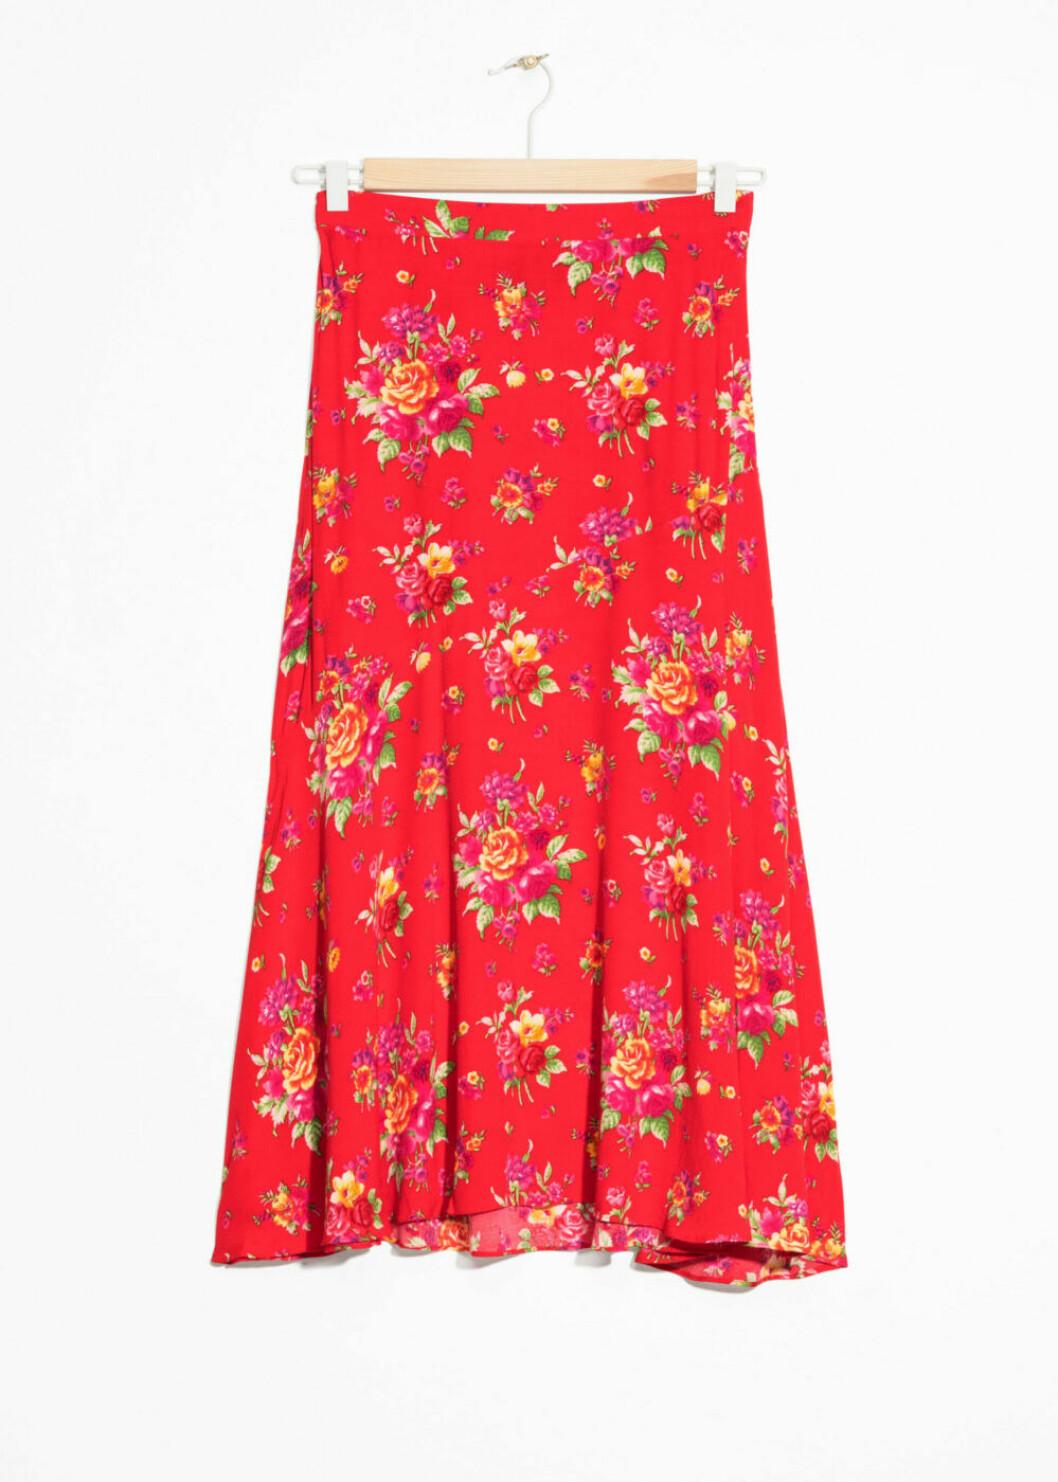 Blommig röd kjol